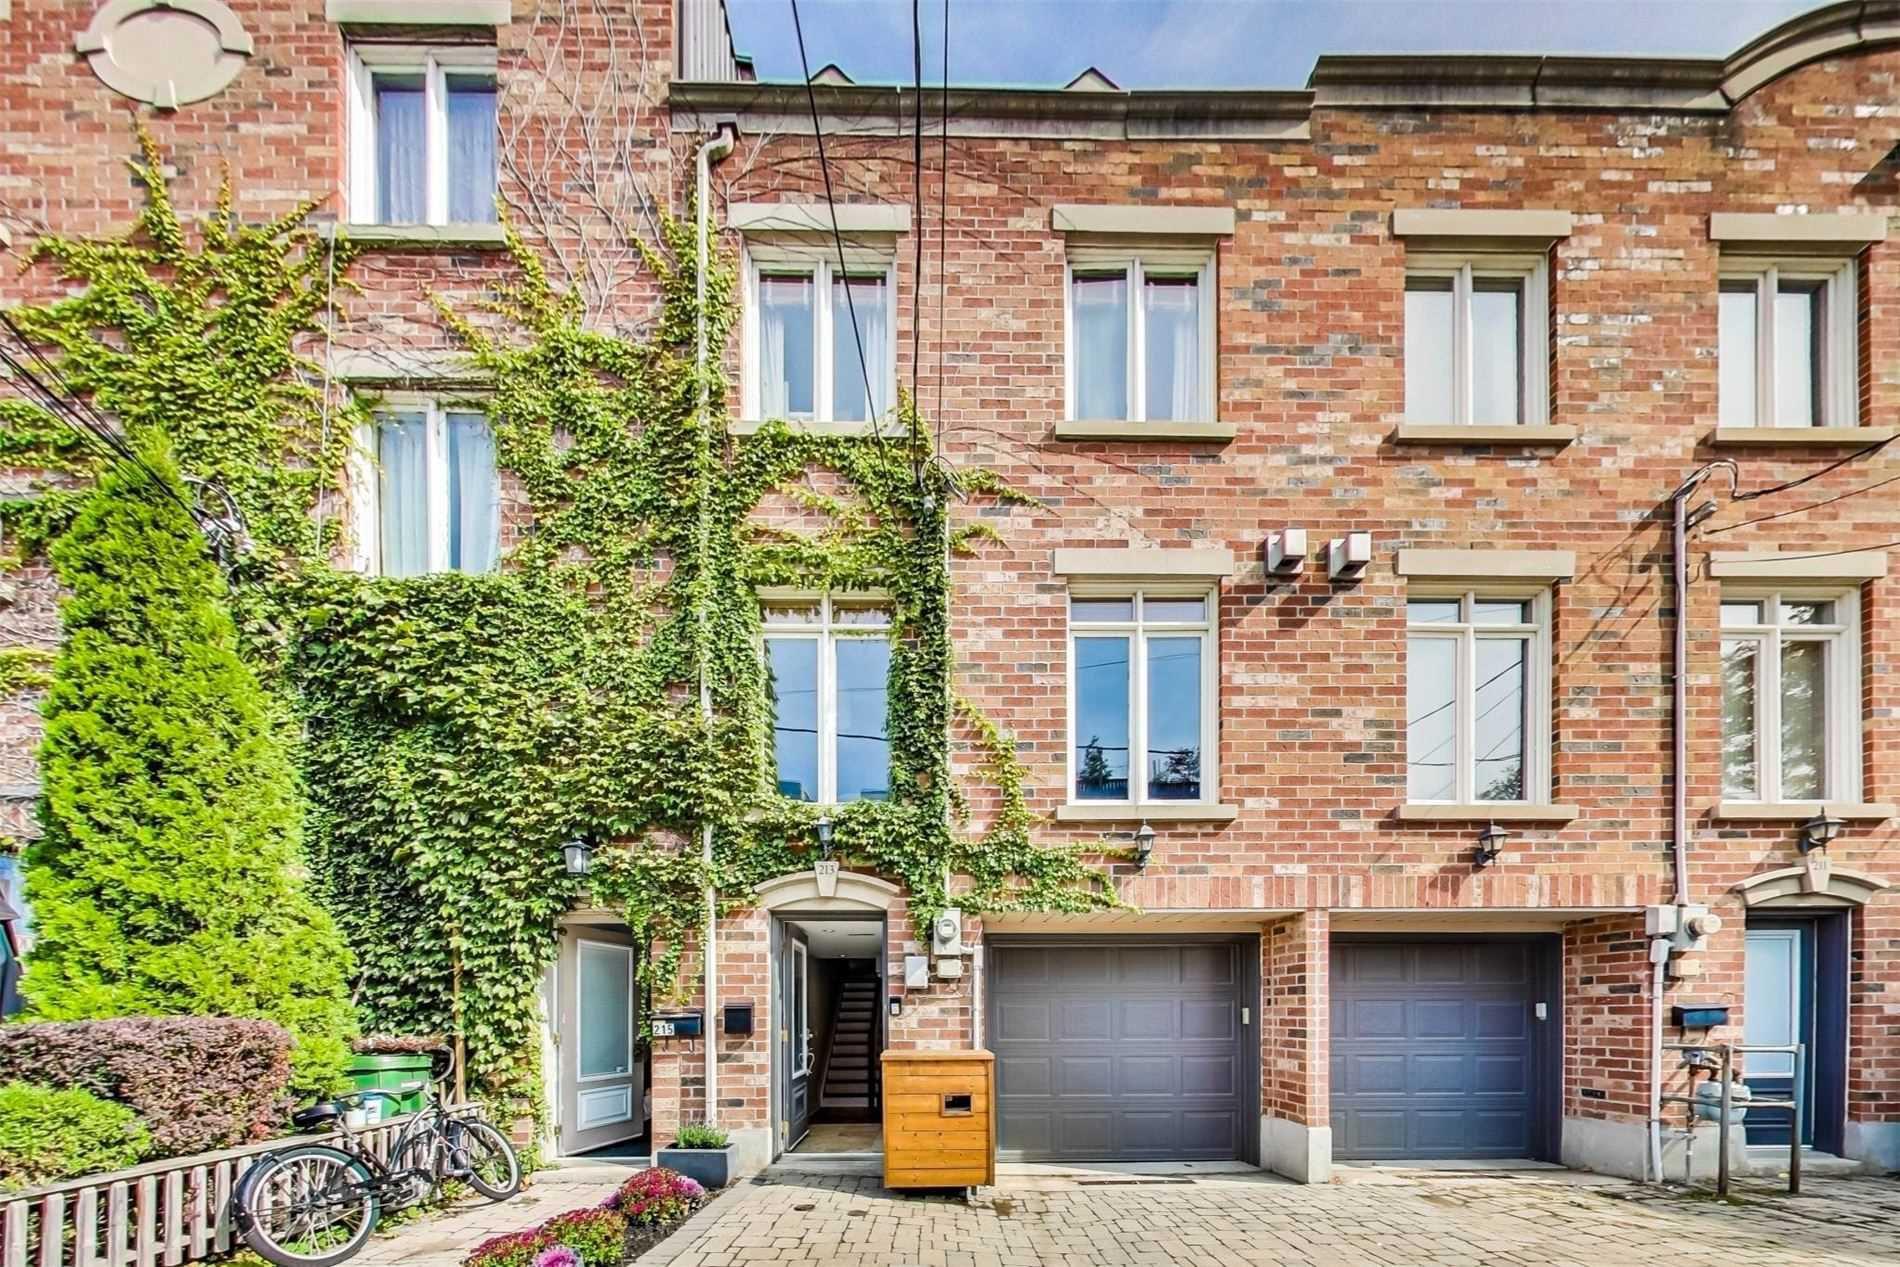 Photo 1: Photos: 213 Heward Avenue in Toronto: South Riverdale House (3-Storey) for sale (Toronto E01)  : MLS®# E4941877